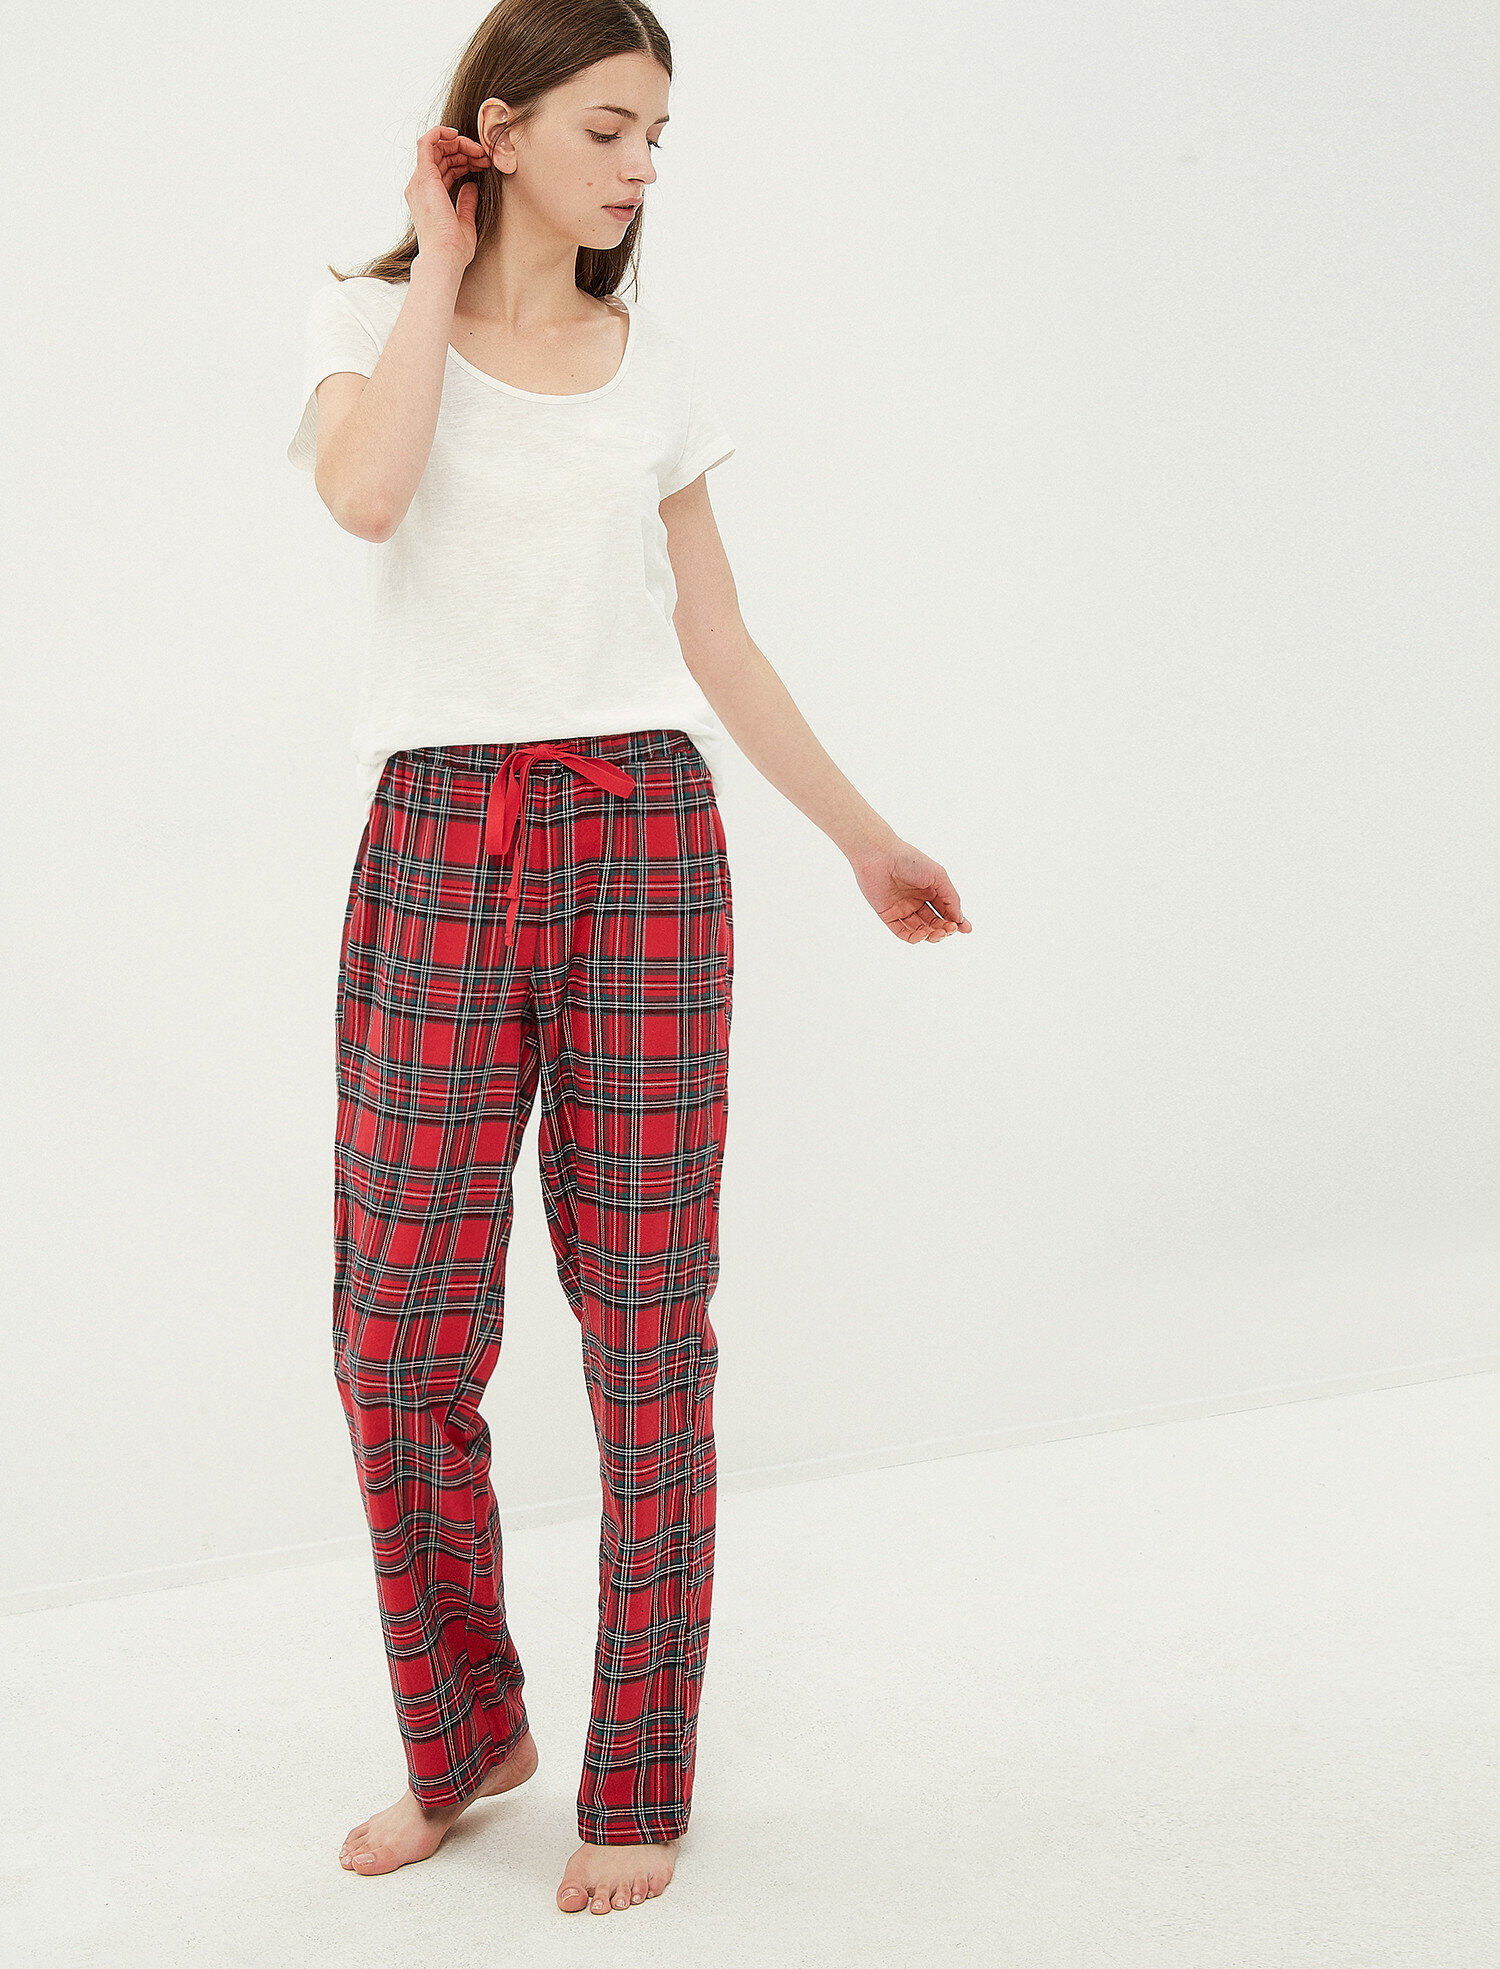 2855d0daa1d92 Kırmızı Bayan Kareli Pijama Altı 7KLK71823MW12U   Koton